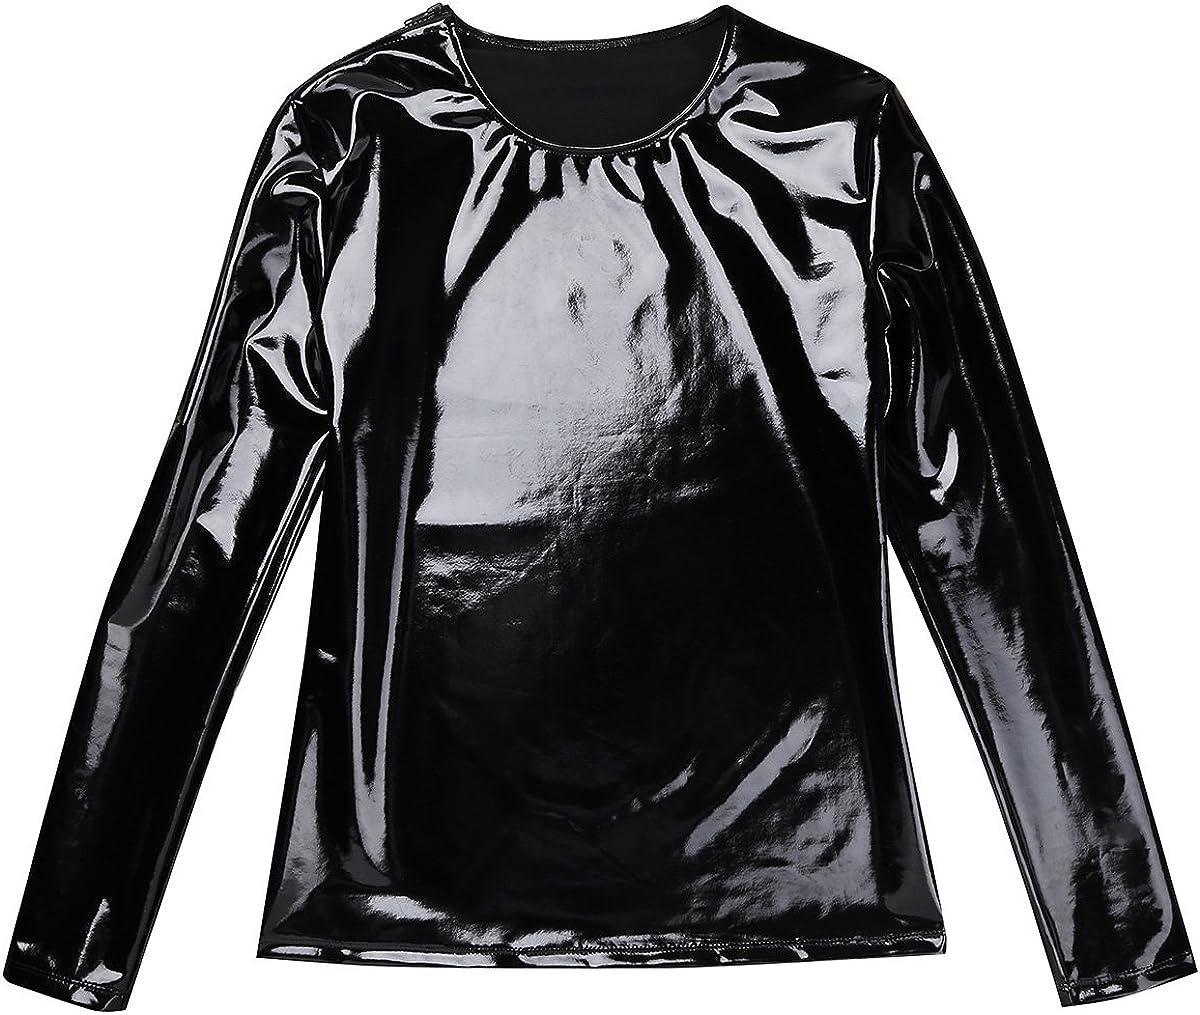 ranrann Mens Wet Look PVC Leather Long Sleeve T Shirt Clubwear Side Zipper Tops Jacket Shirts Blouse